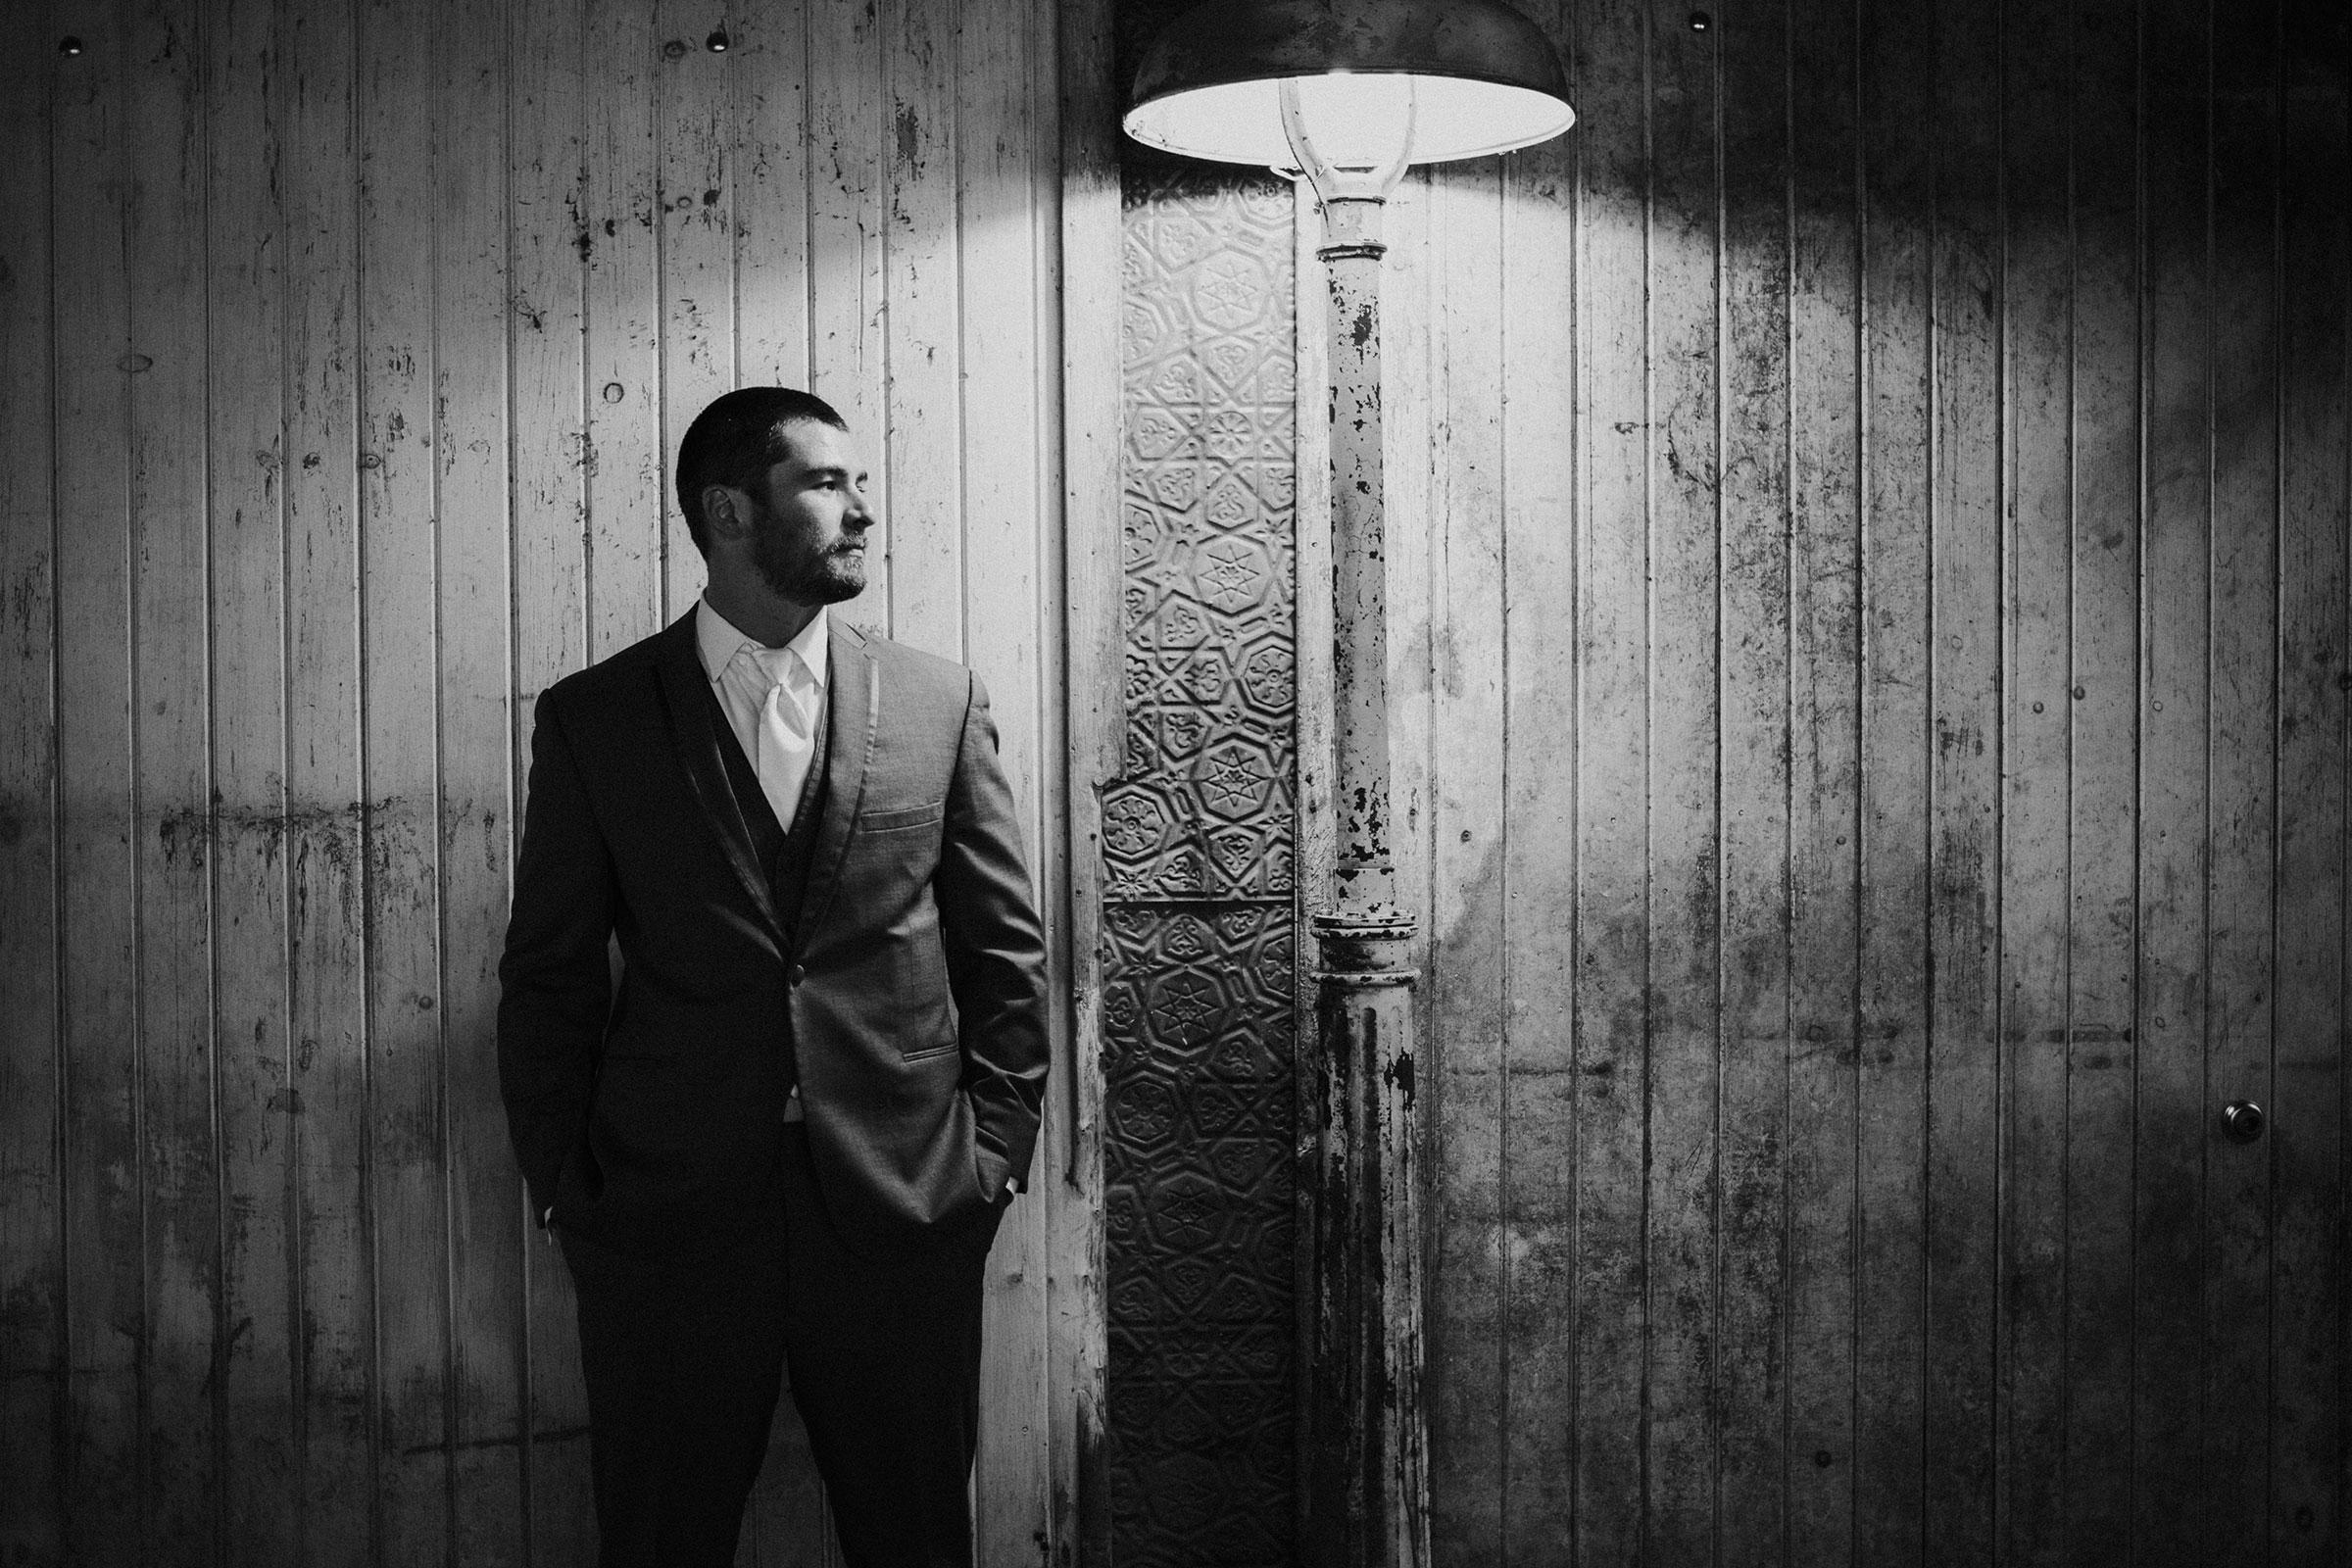 groom-standing-under-light-decades-event-center-building-desmoines-iowa-raelyn-ramey-photography..jpg